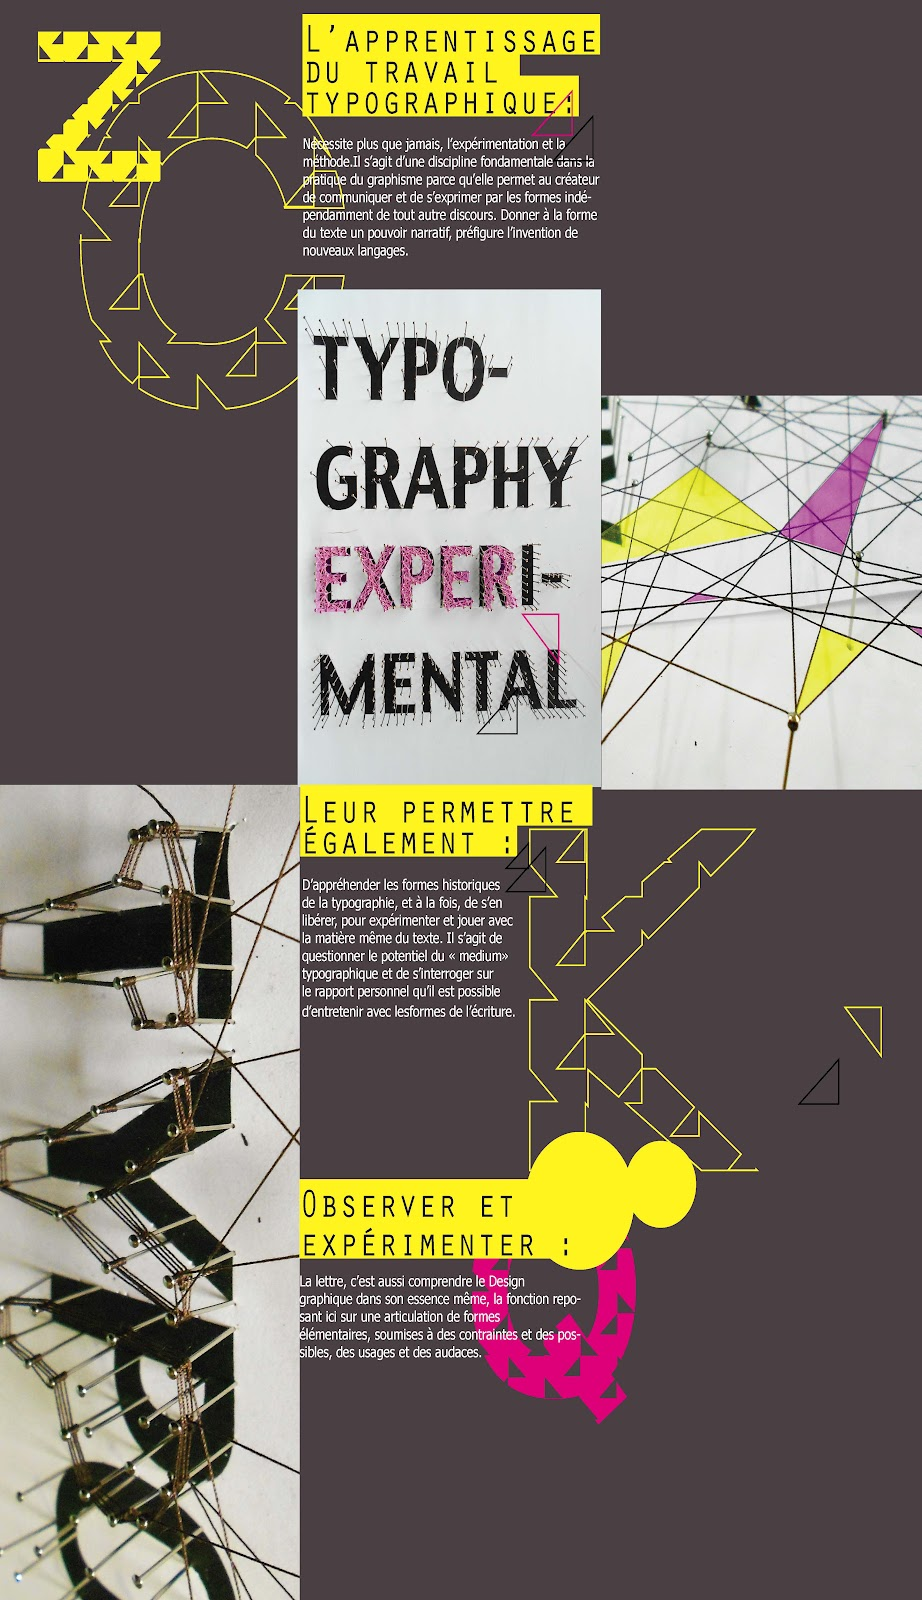 process and ways  typographie filaire      1cvpm      derni u00e8re  u00e9tape